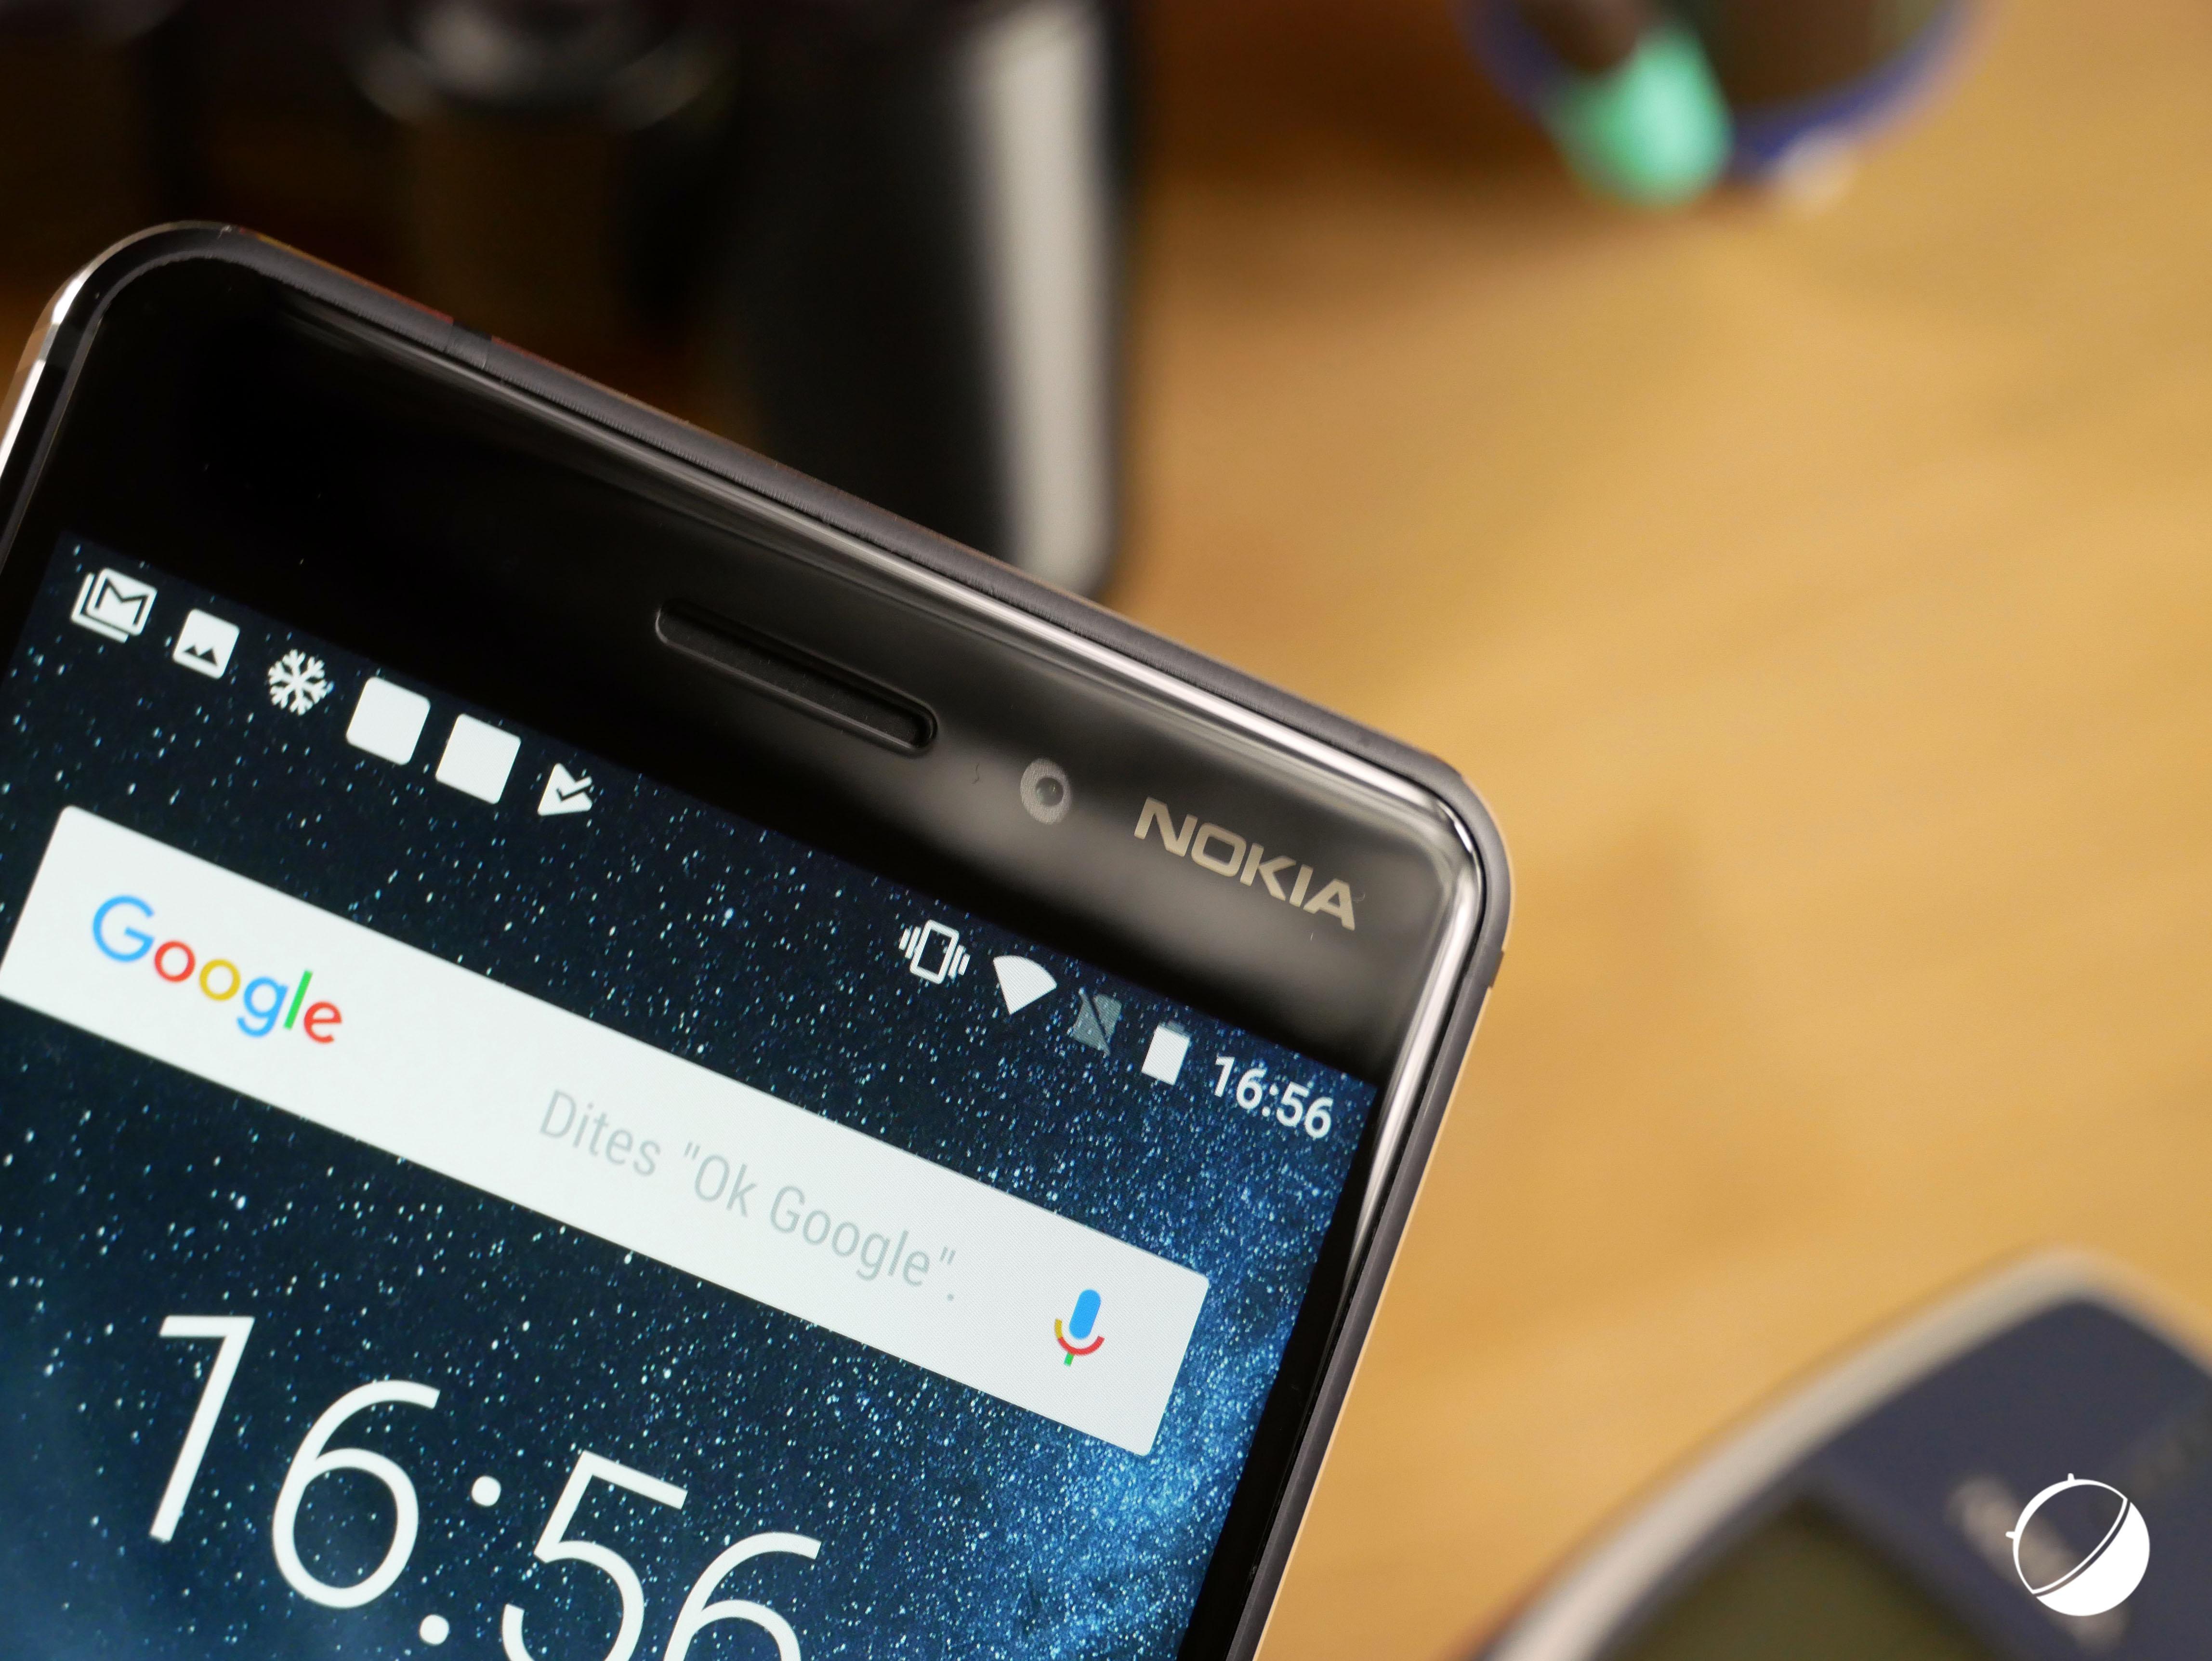 Nokia 6 prise en main